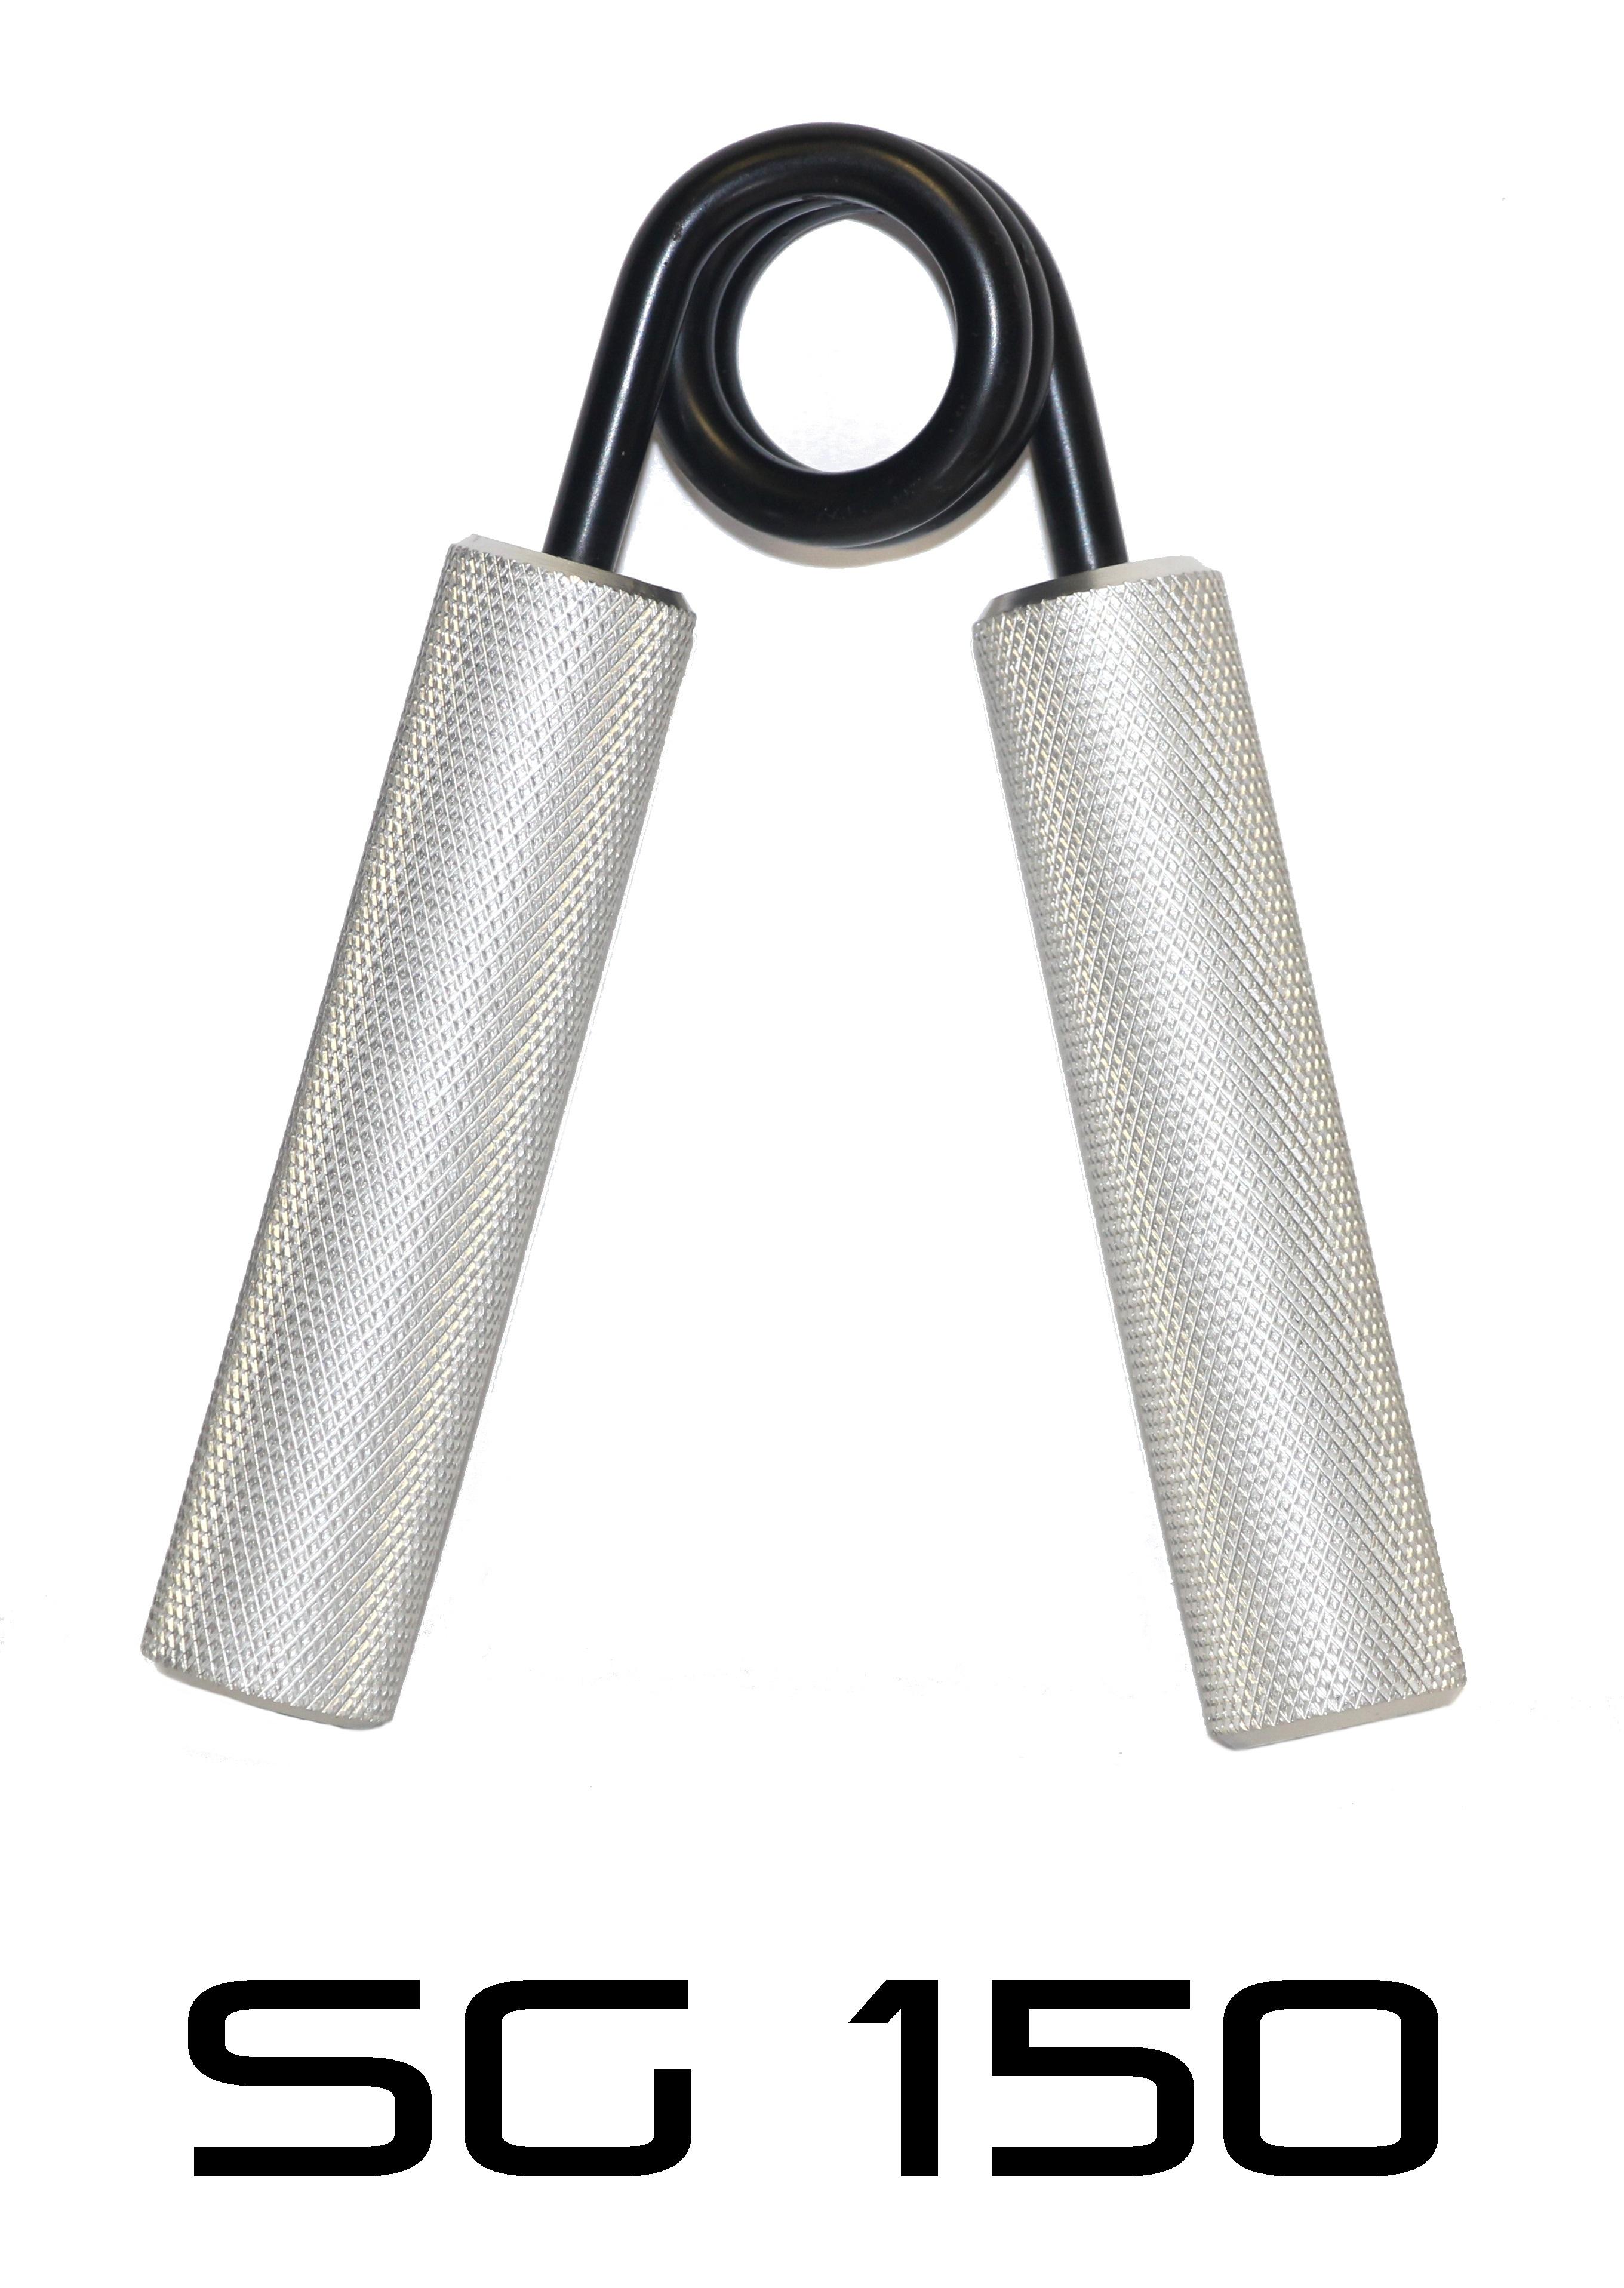 Serious Steel Fitness Steel Hand Gripper Heavy Hand Strengthener Hand Grip Grip Strength Trainer